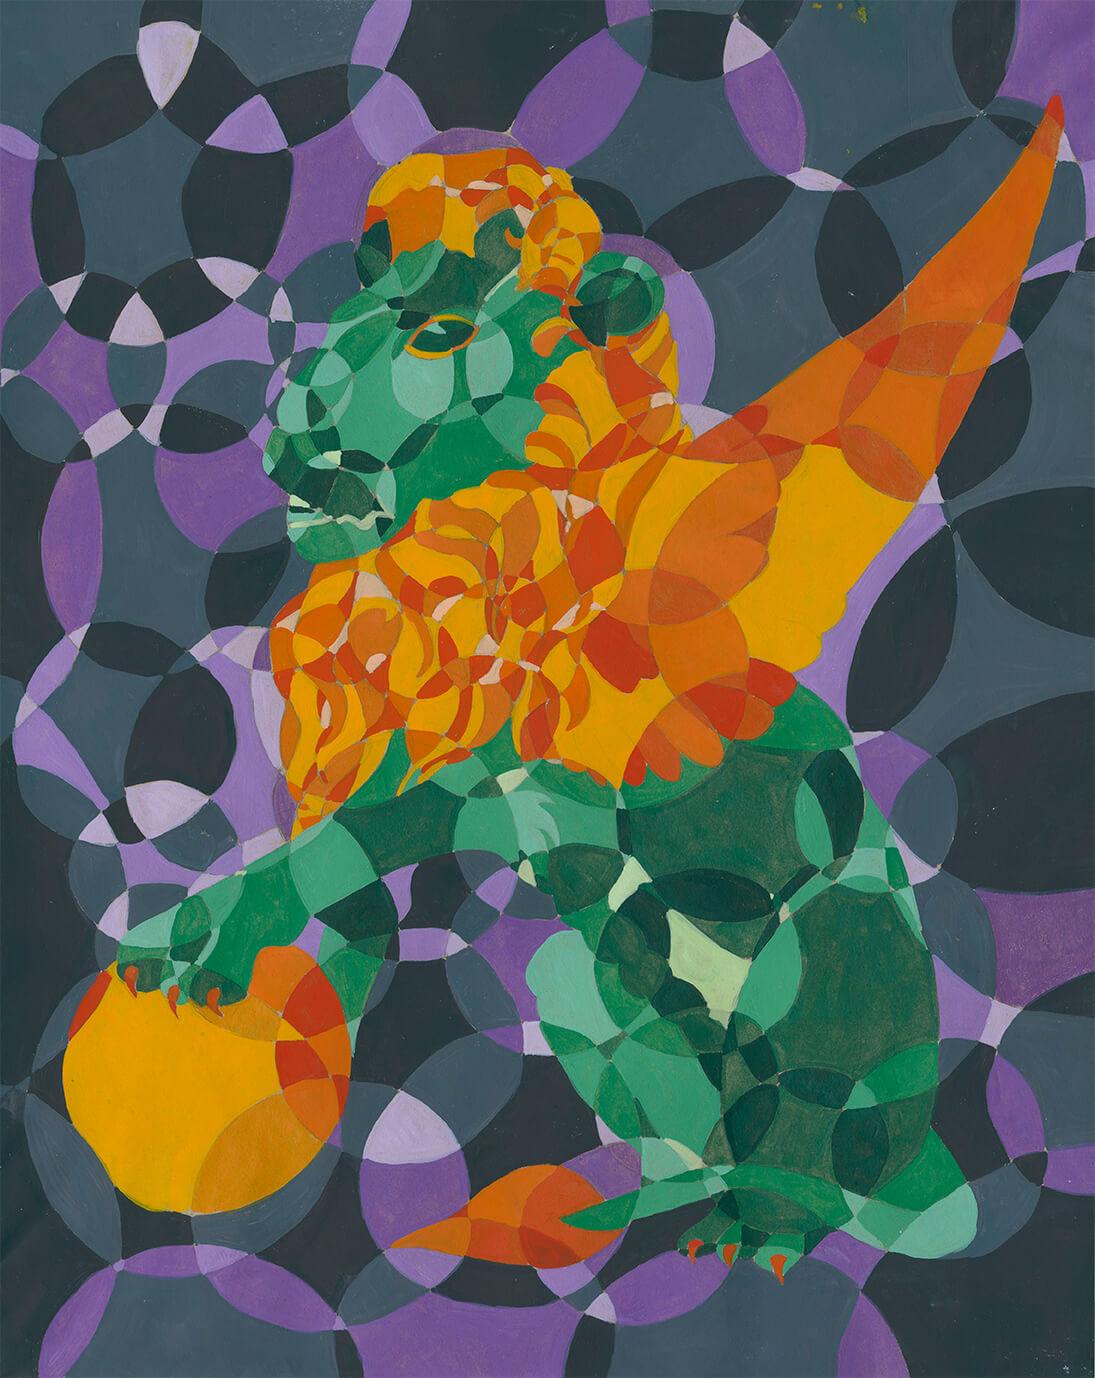 Kreise, painting, tempera, farbkontraste